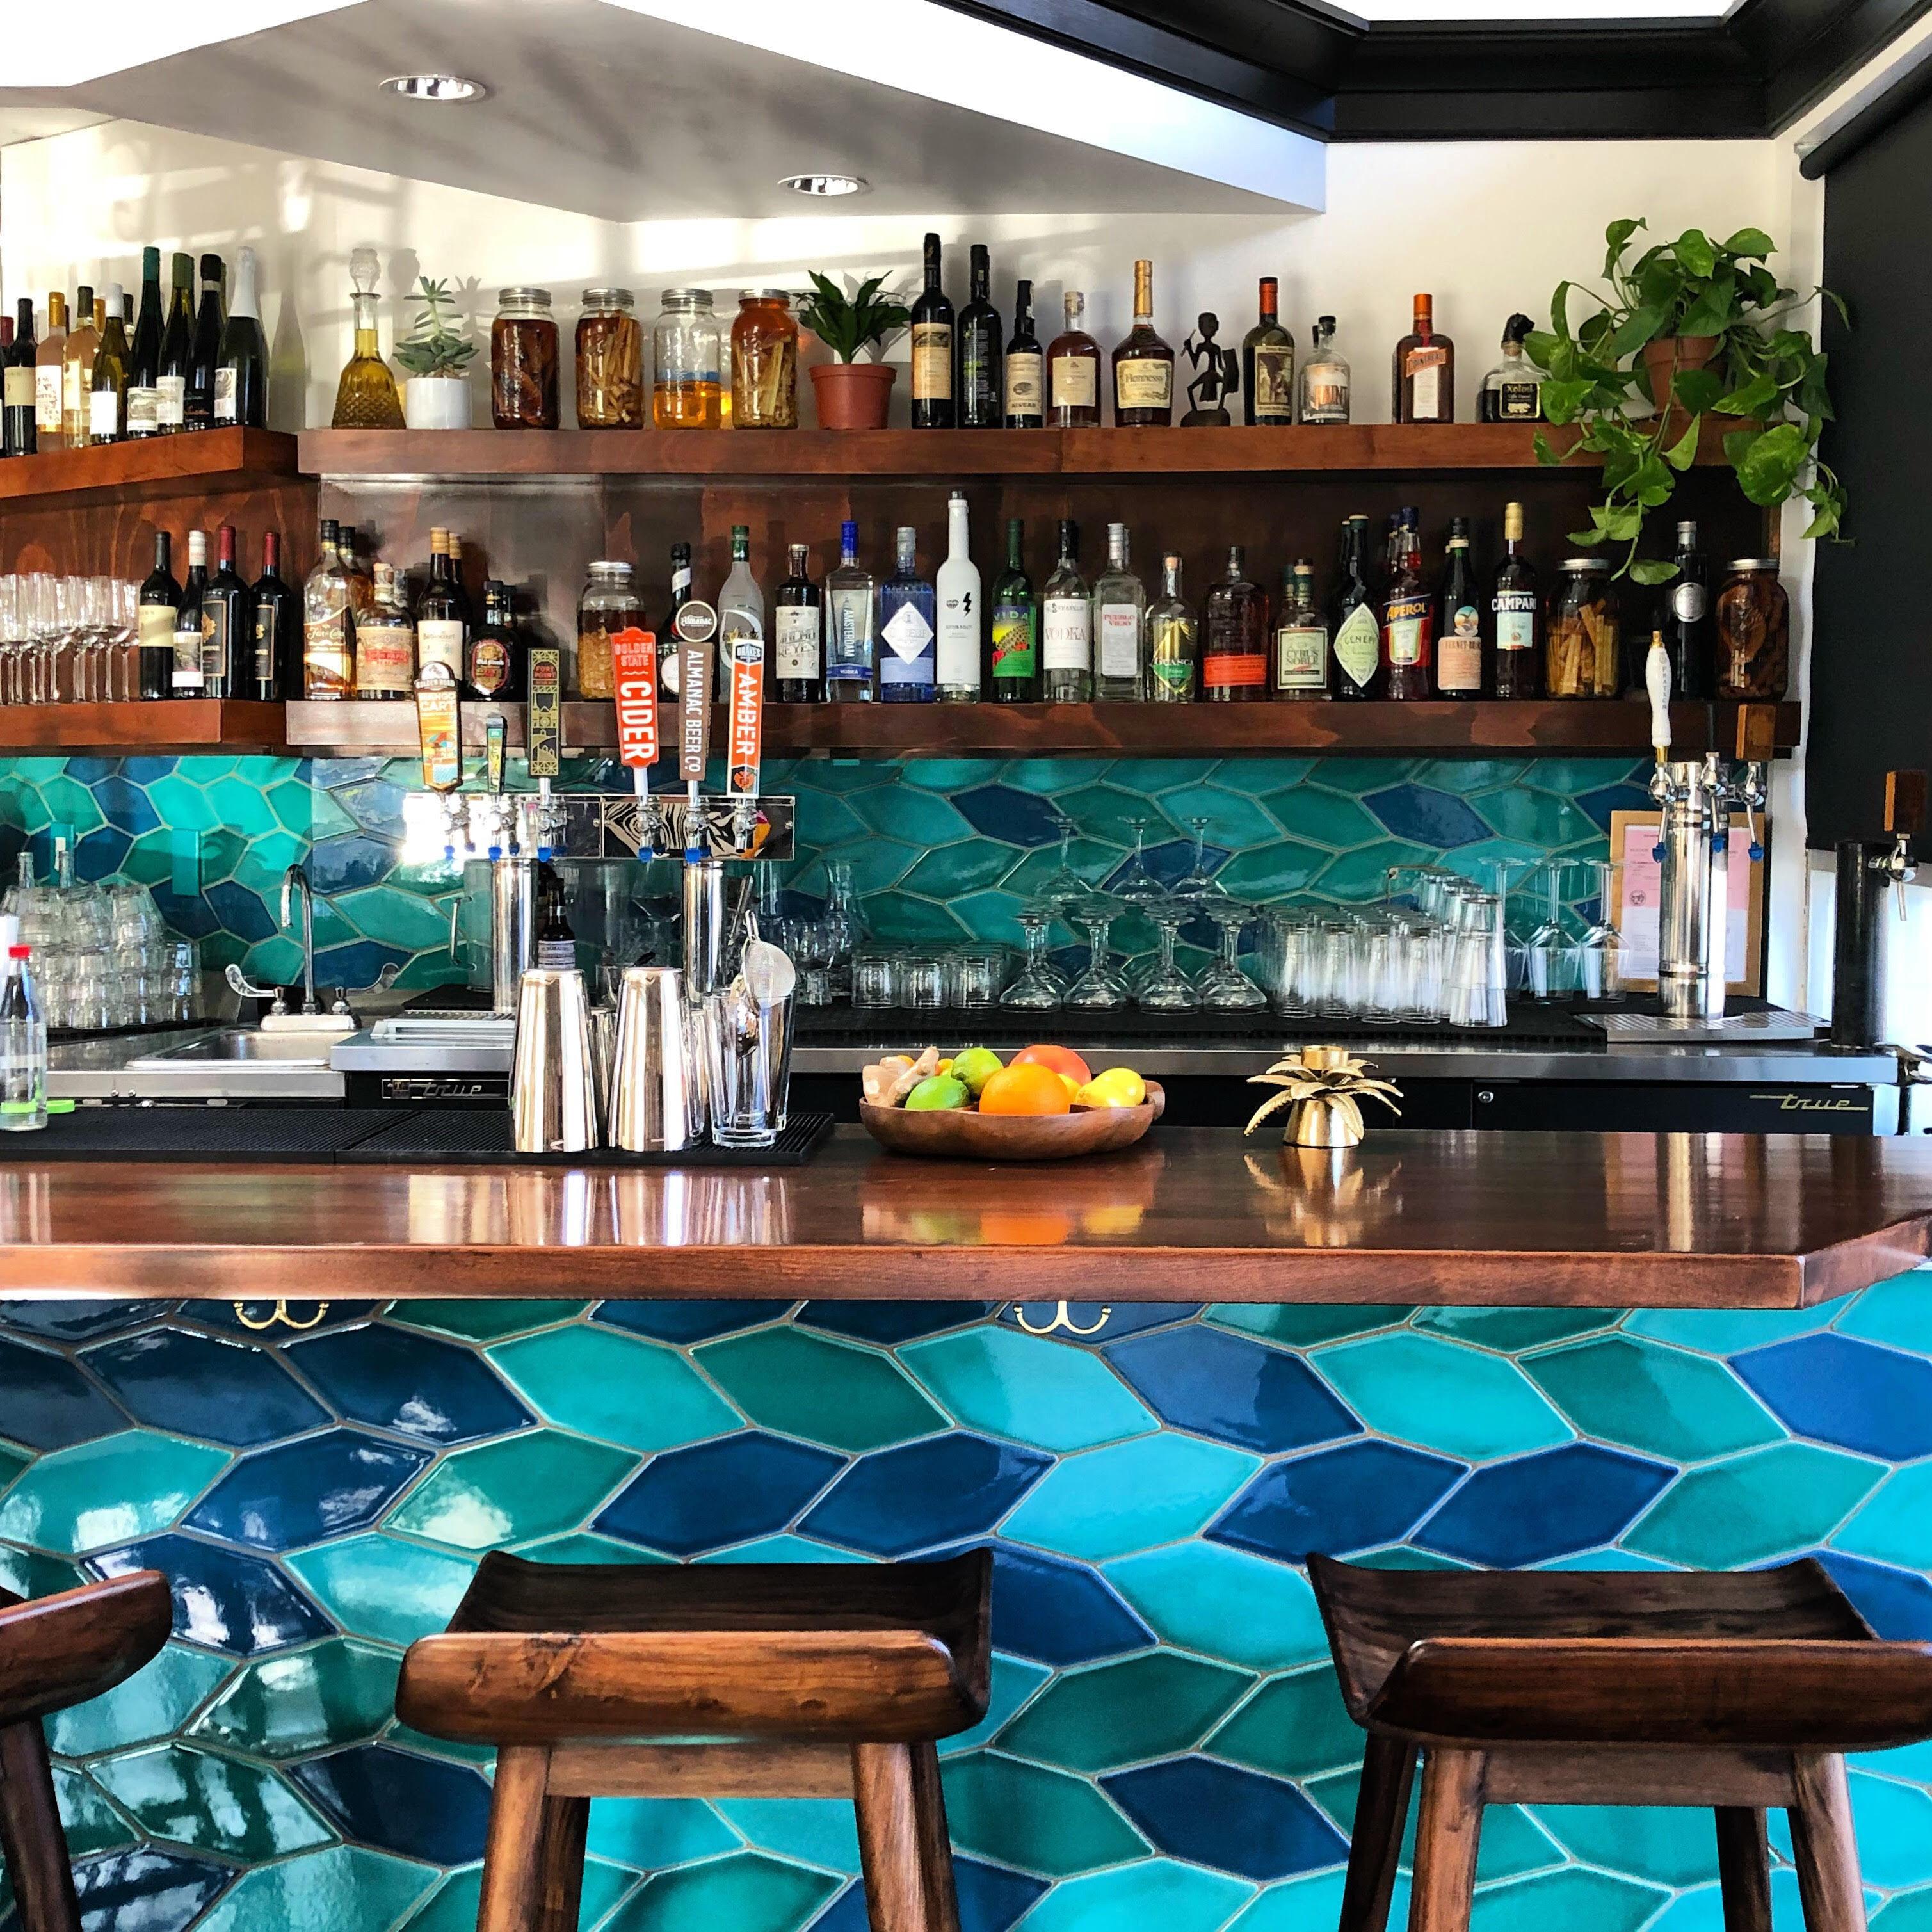 2018_img_RIGHTS_fob_kitchen_oakland_restaurant_bar_commercial_picket_braid_blend_bora_bora_adriratic_sea_naples_blue_FC224242_B.jpg?mtime=20181205162521#asset:428078